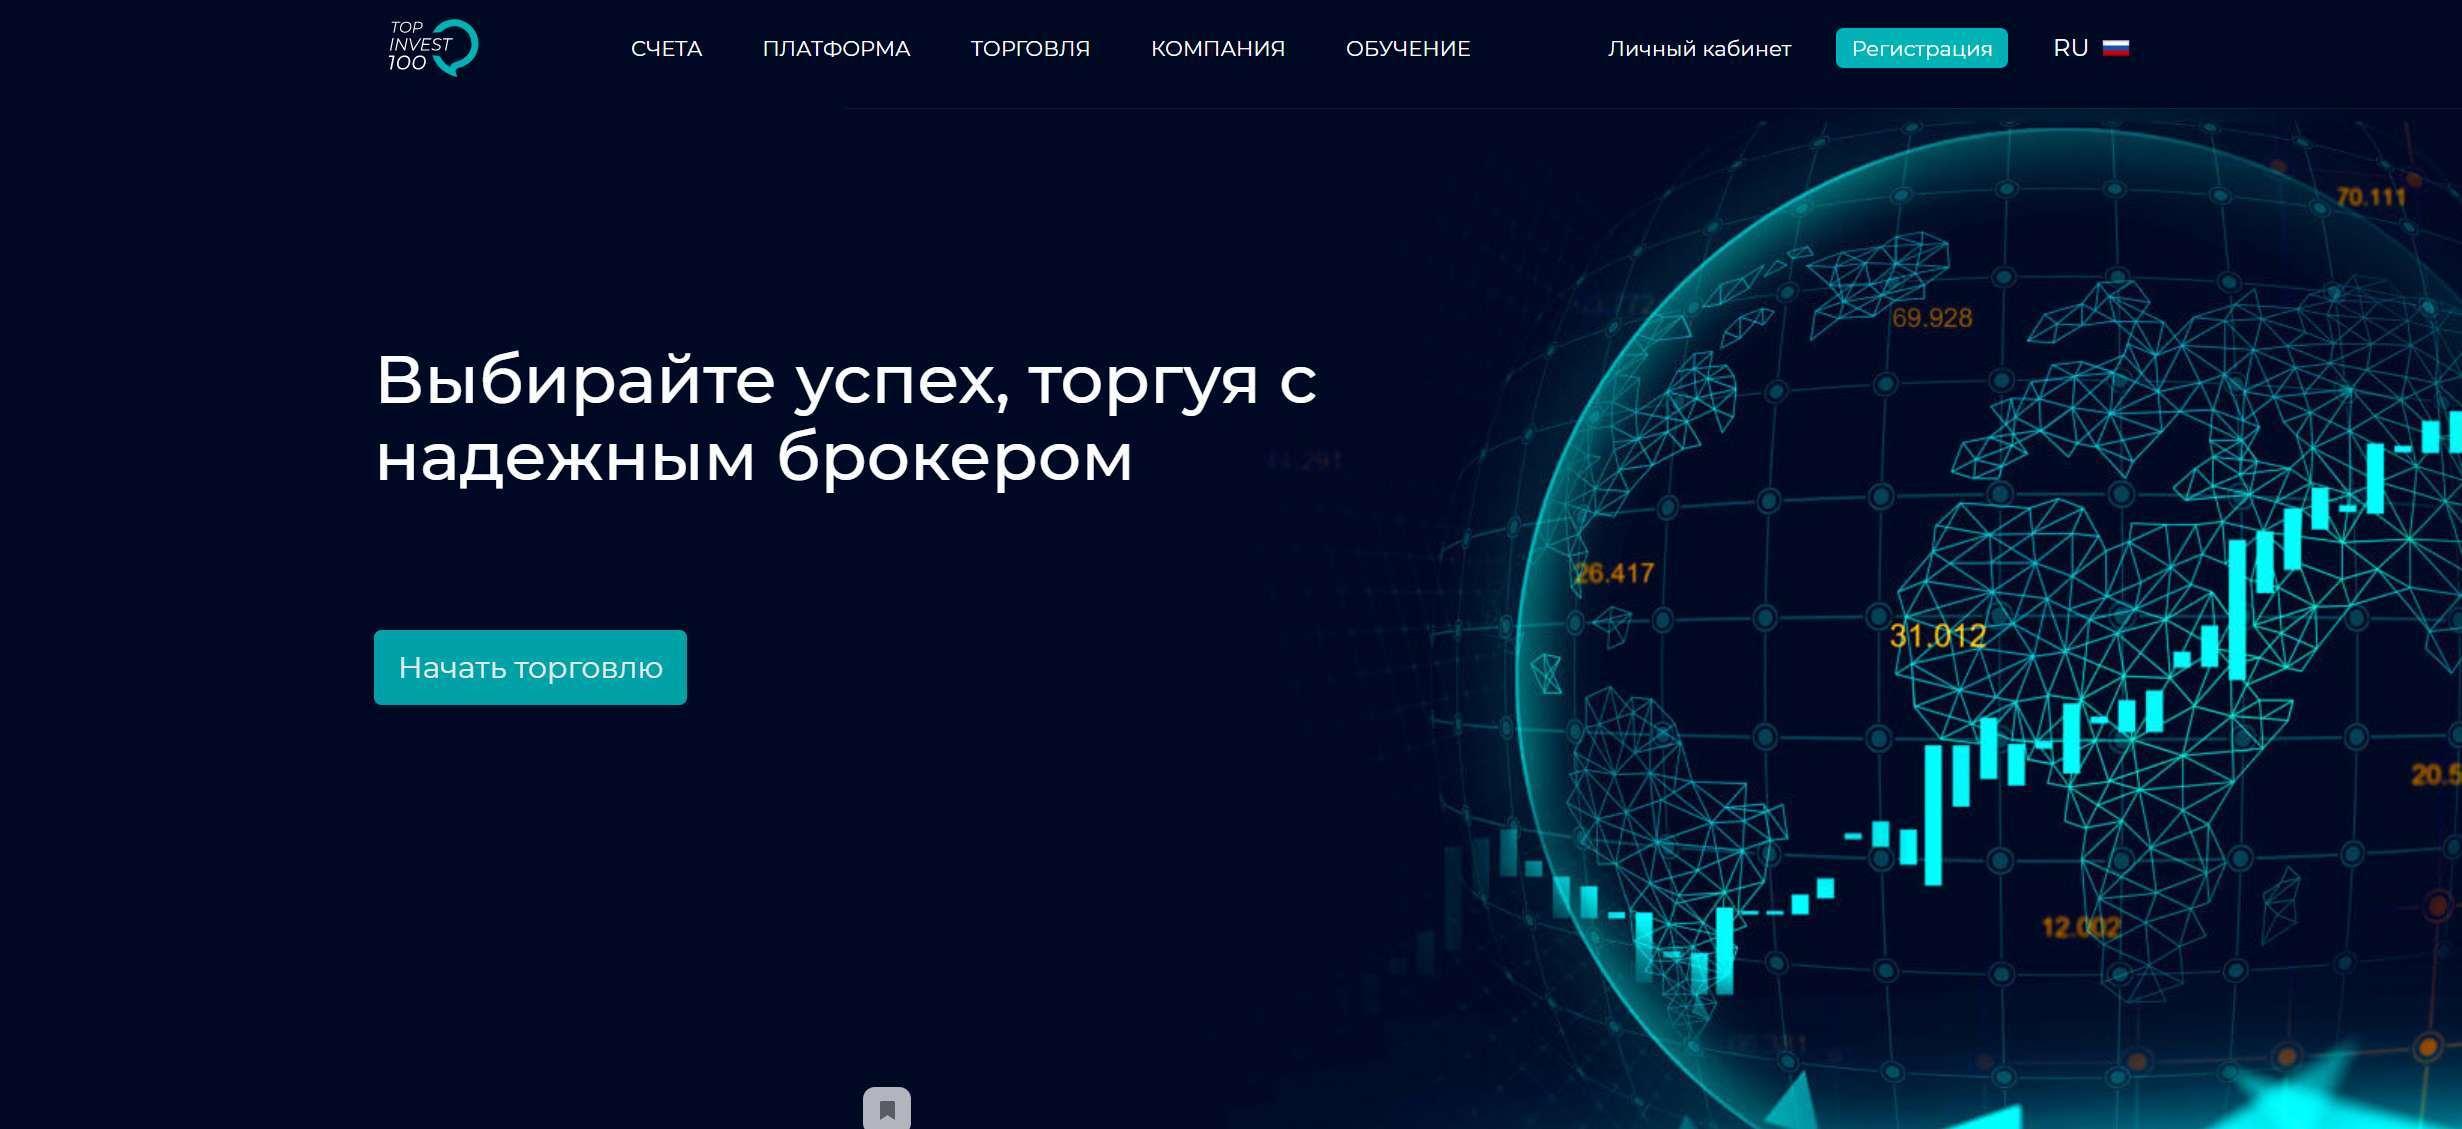 Обзор COMAX INVEST broker